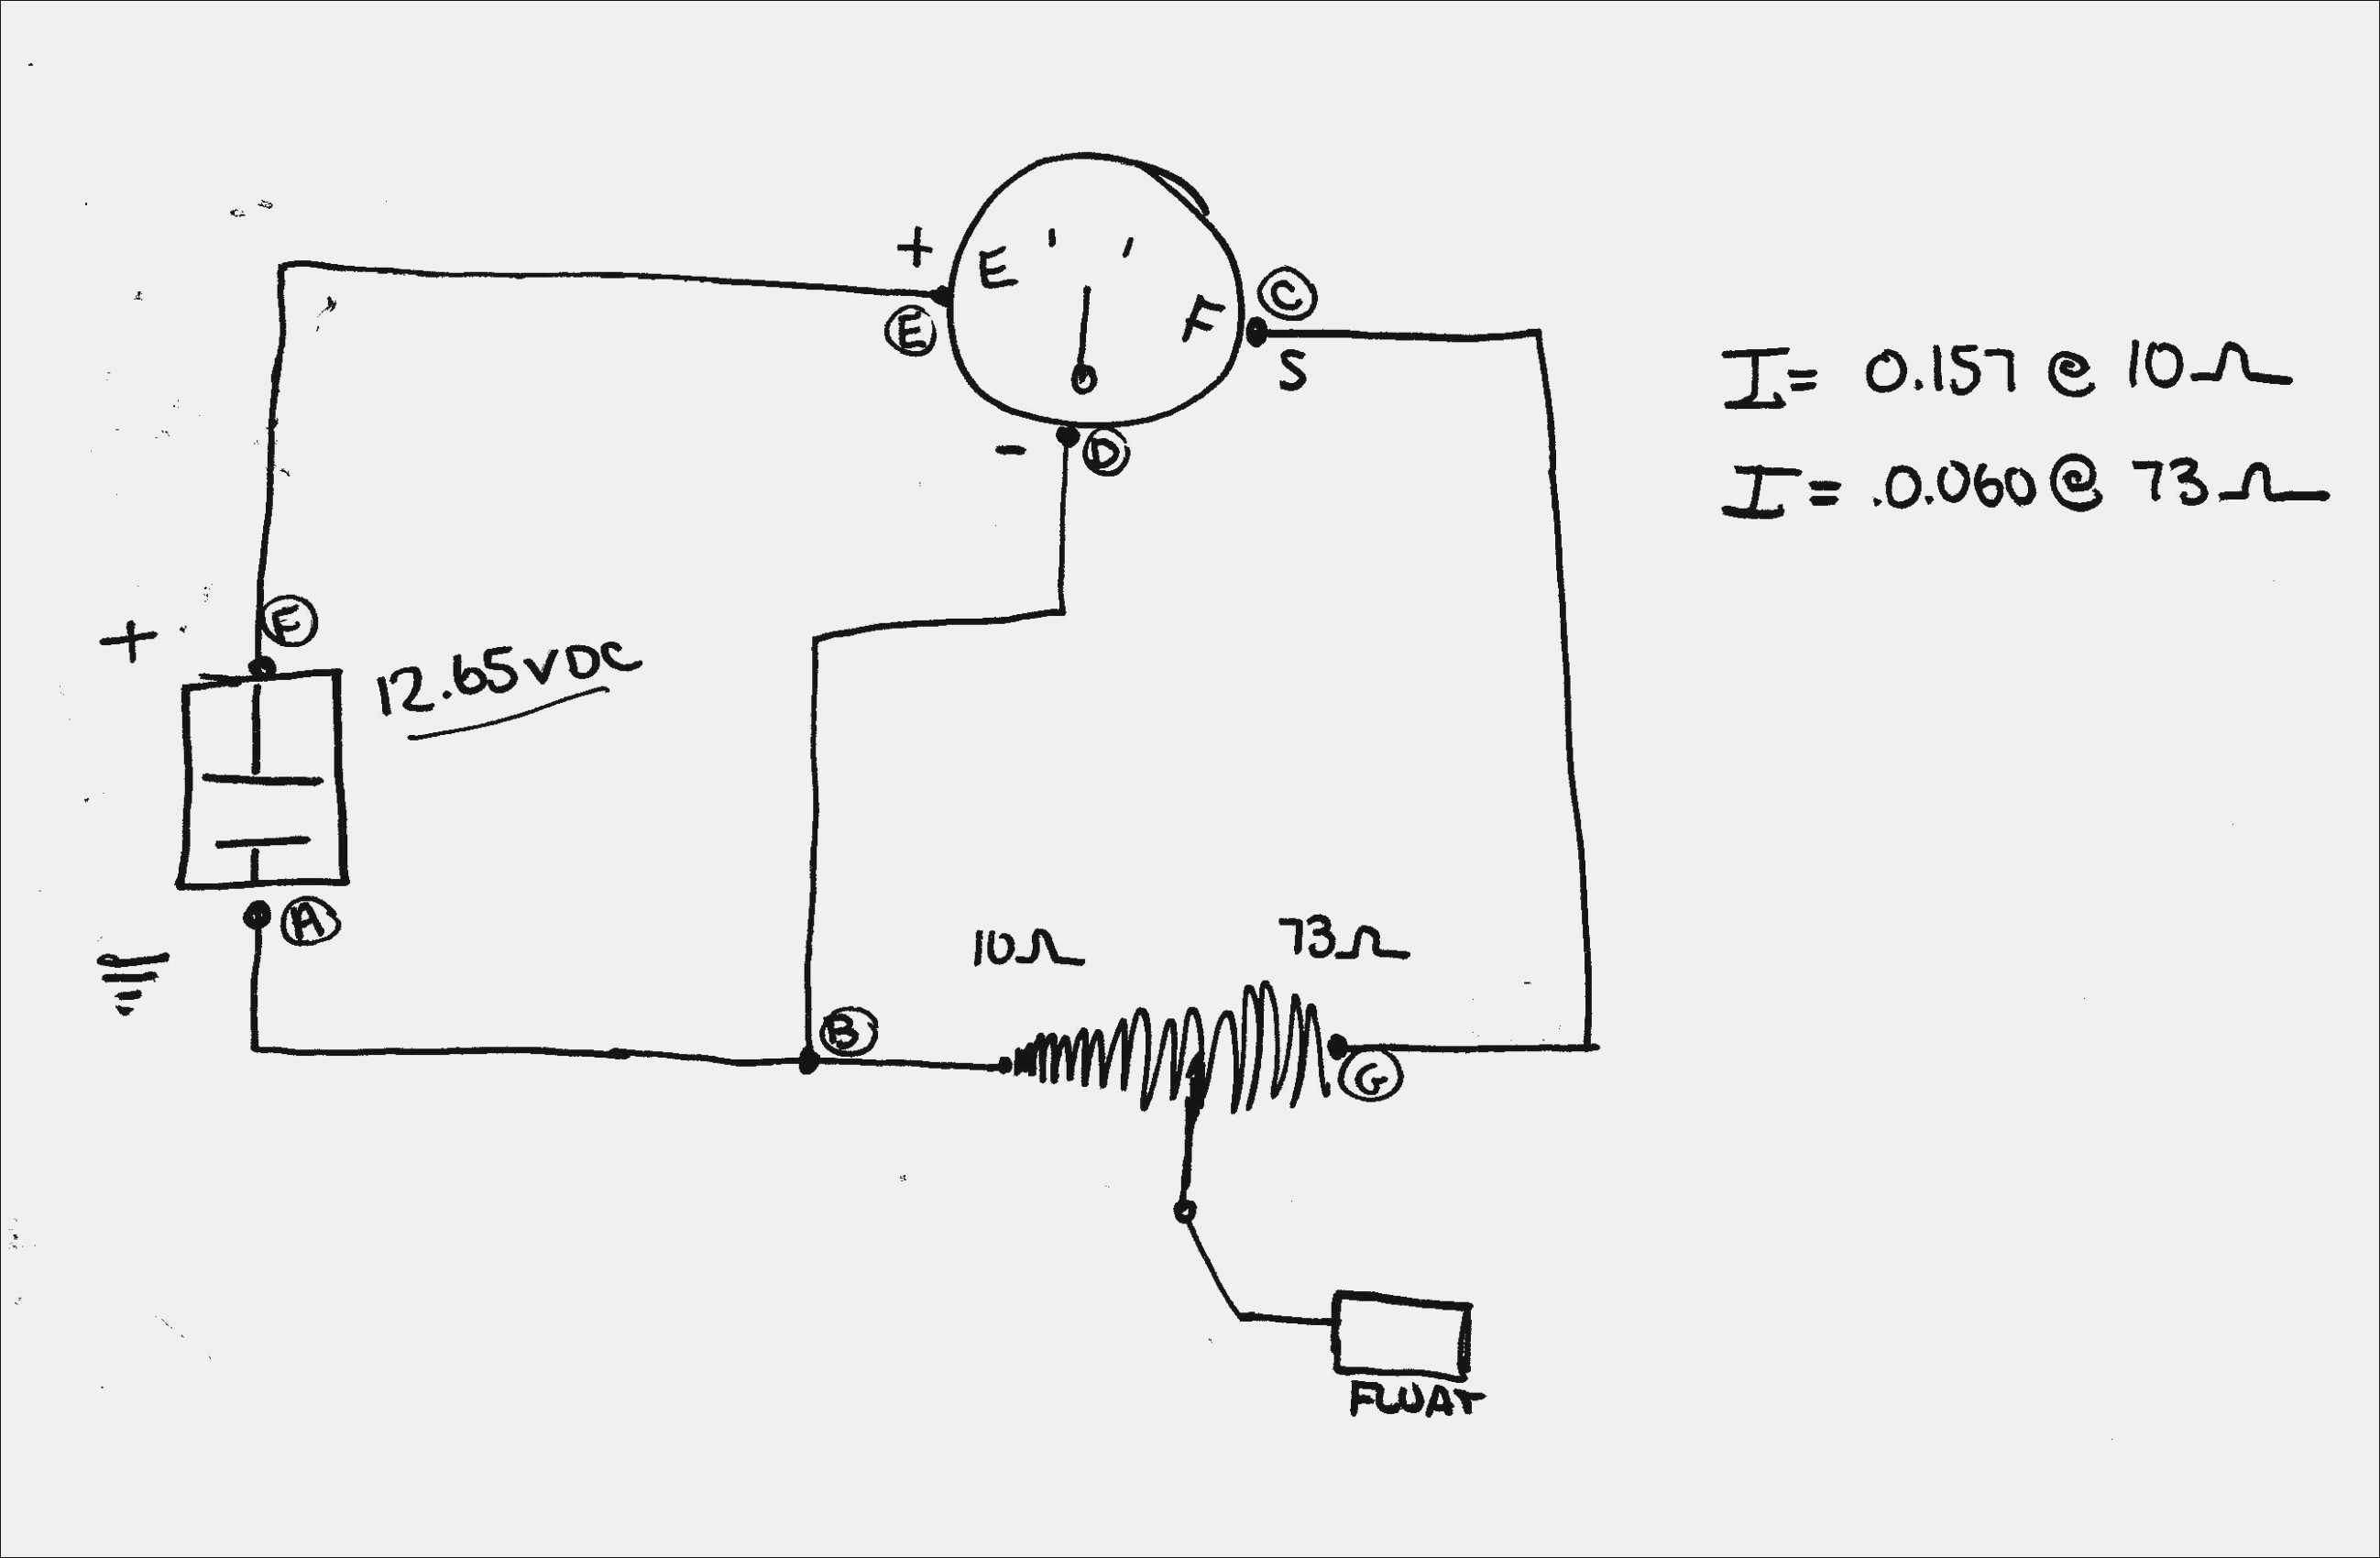 Wiring Diagram Fuel Gauge Manual - Today Wiring Diagram - Fuel Gauge Wiring Diagram